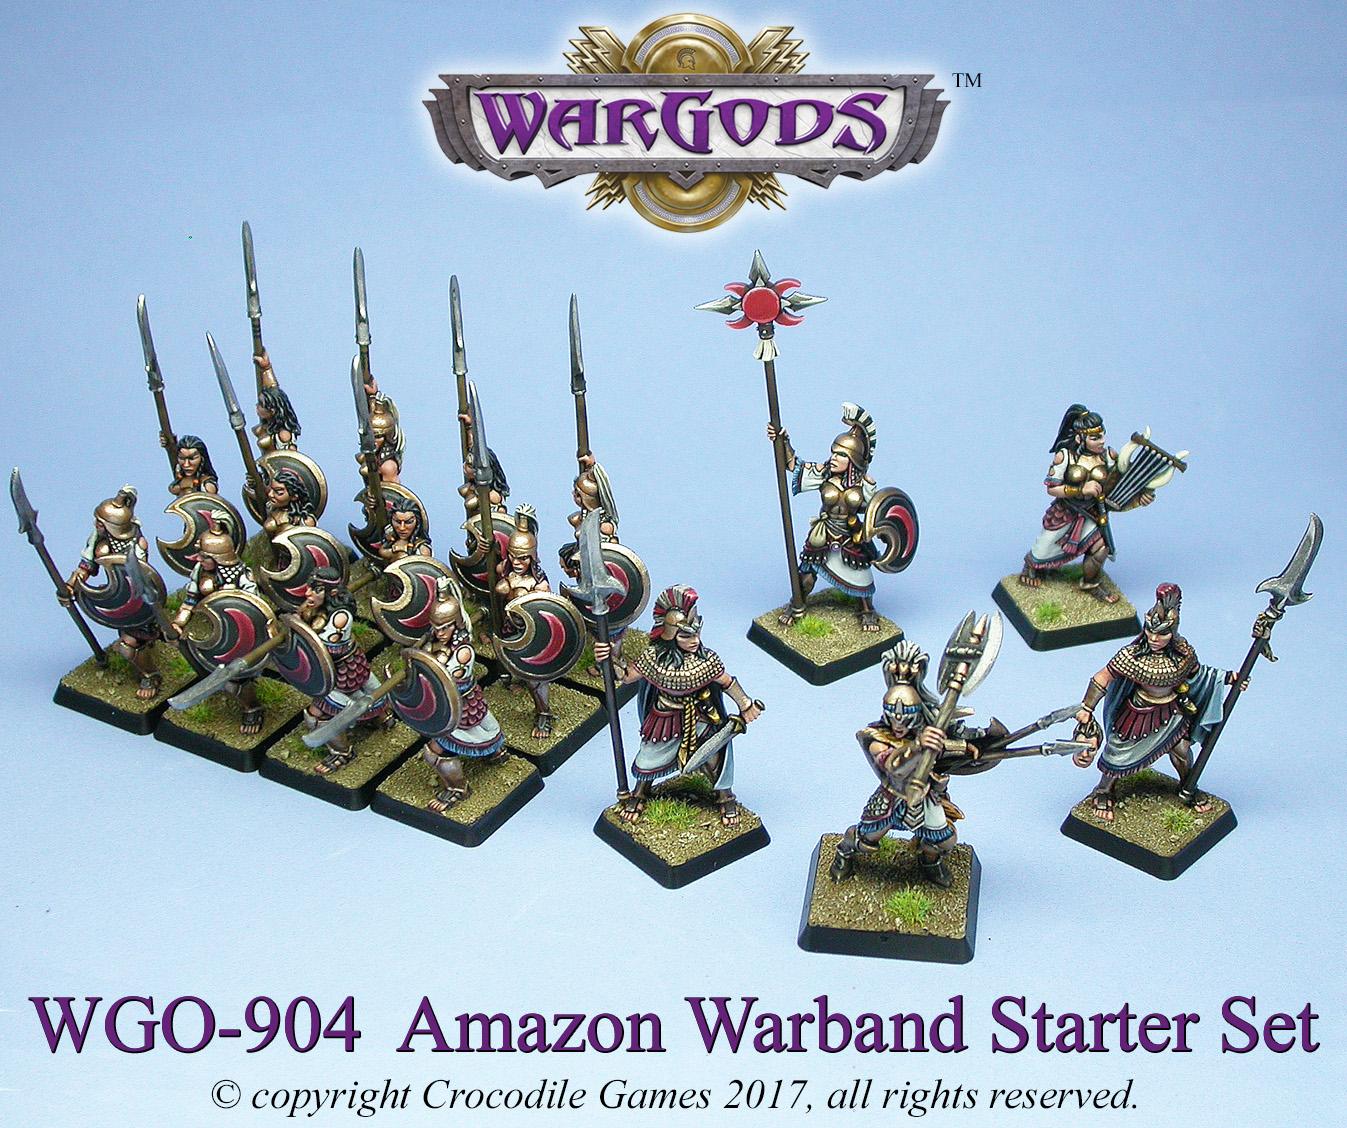 Amazons warband starter set